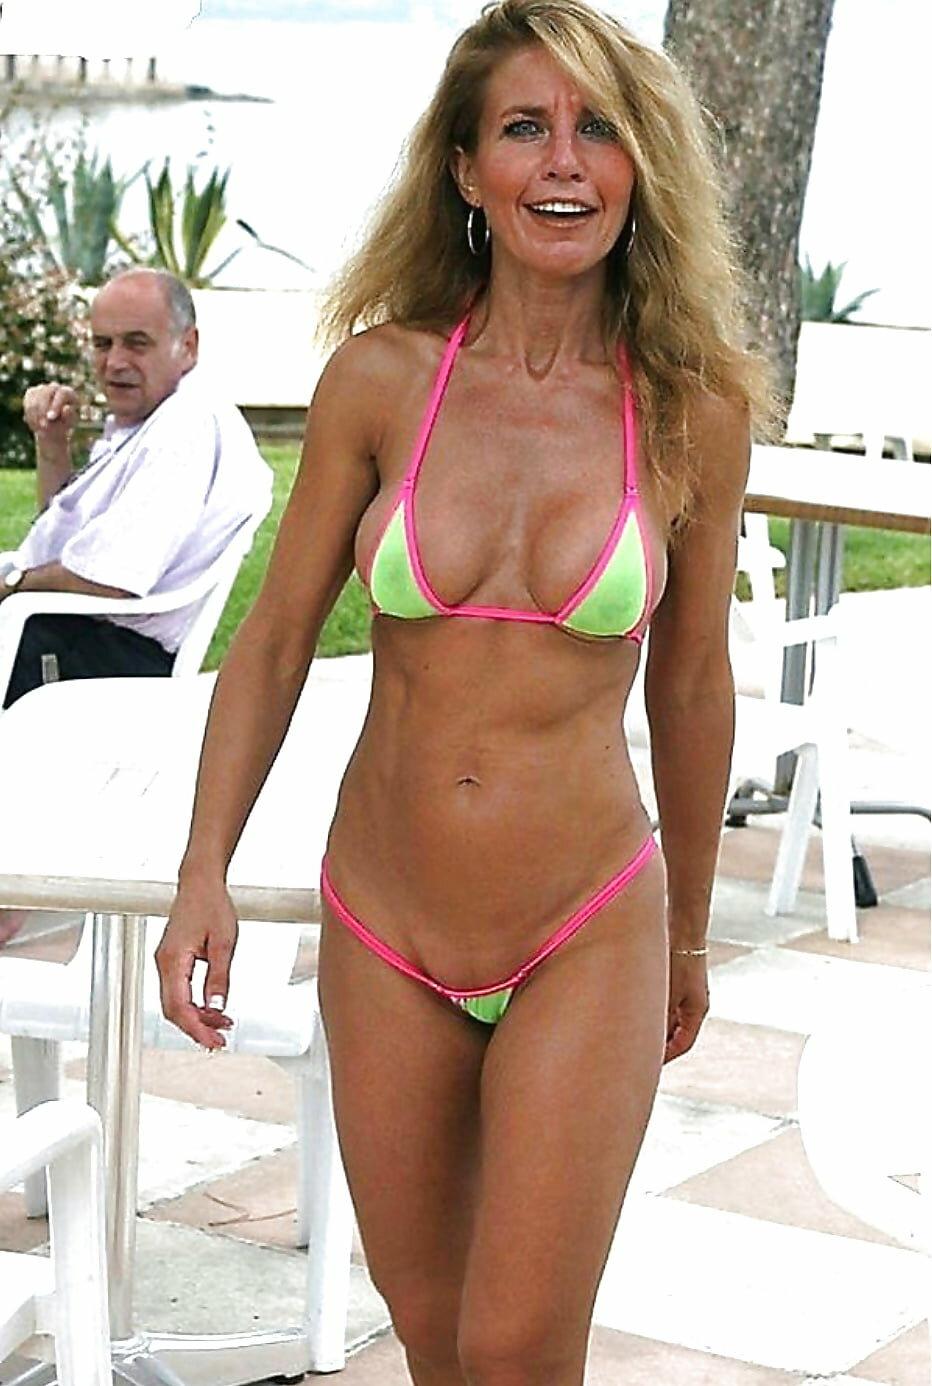 hot-milfs-in-bikini-galleries-busty-blonde-w-boob-ring